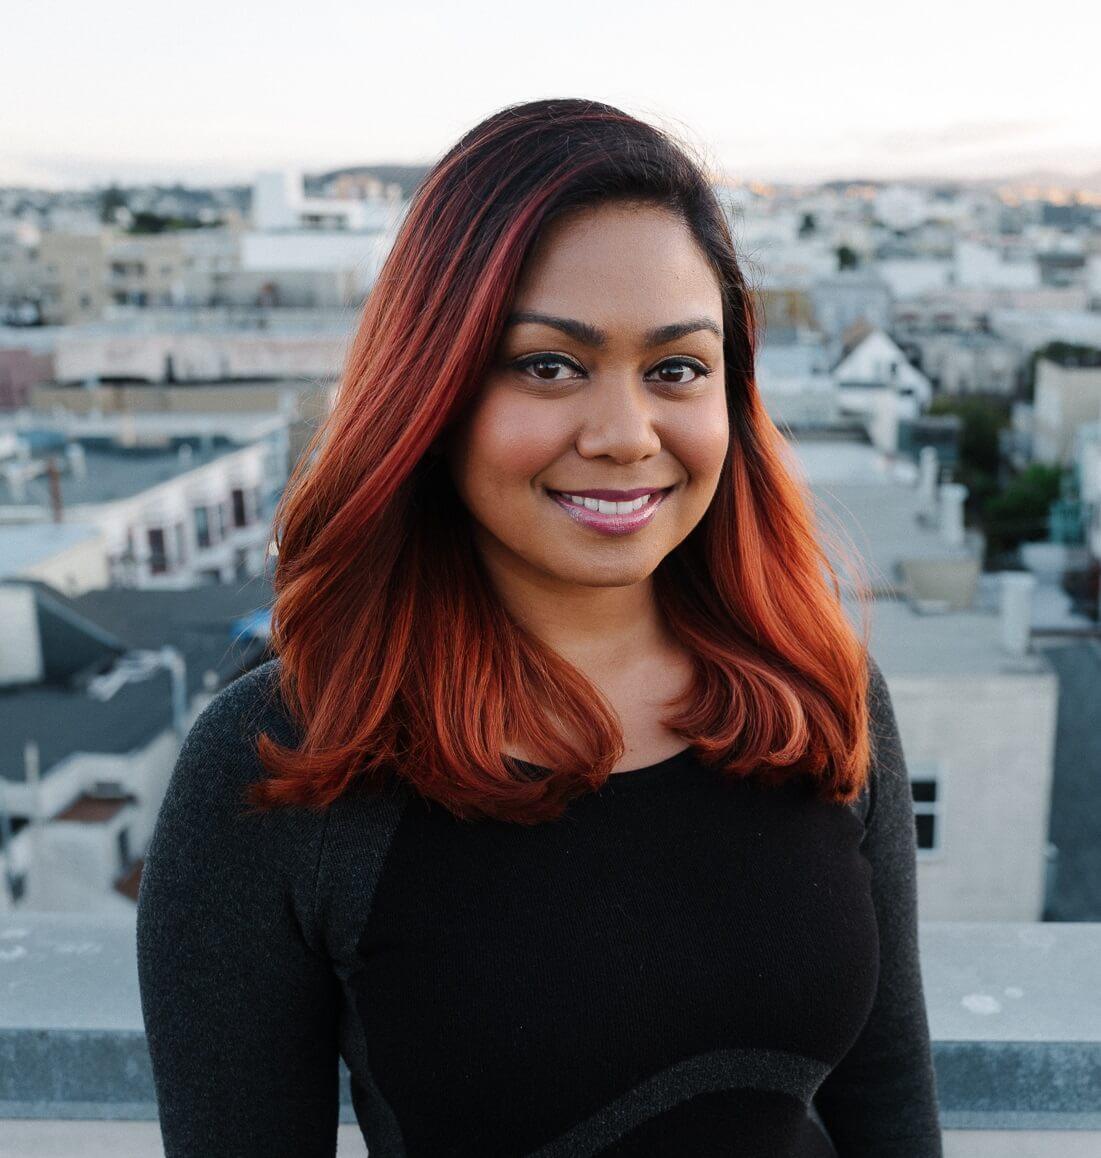 TEDx Speaker & Cal NERDS Alumna Chadni Kazi